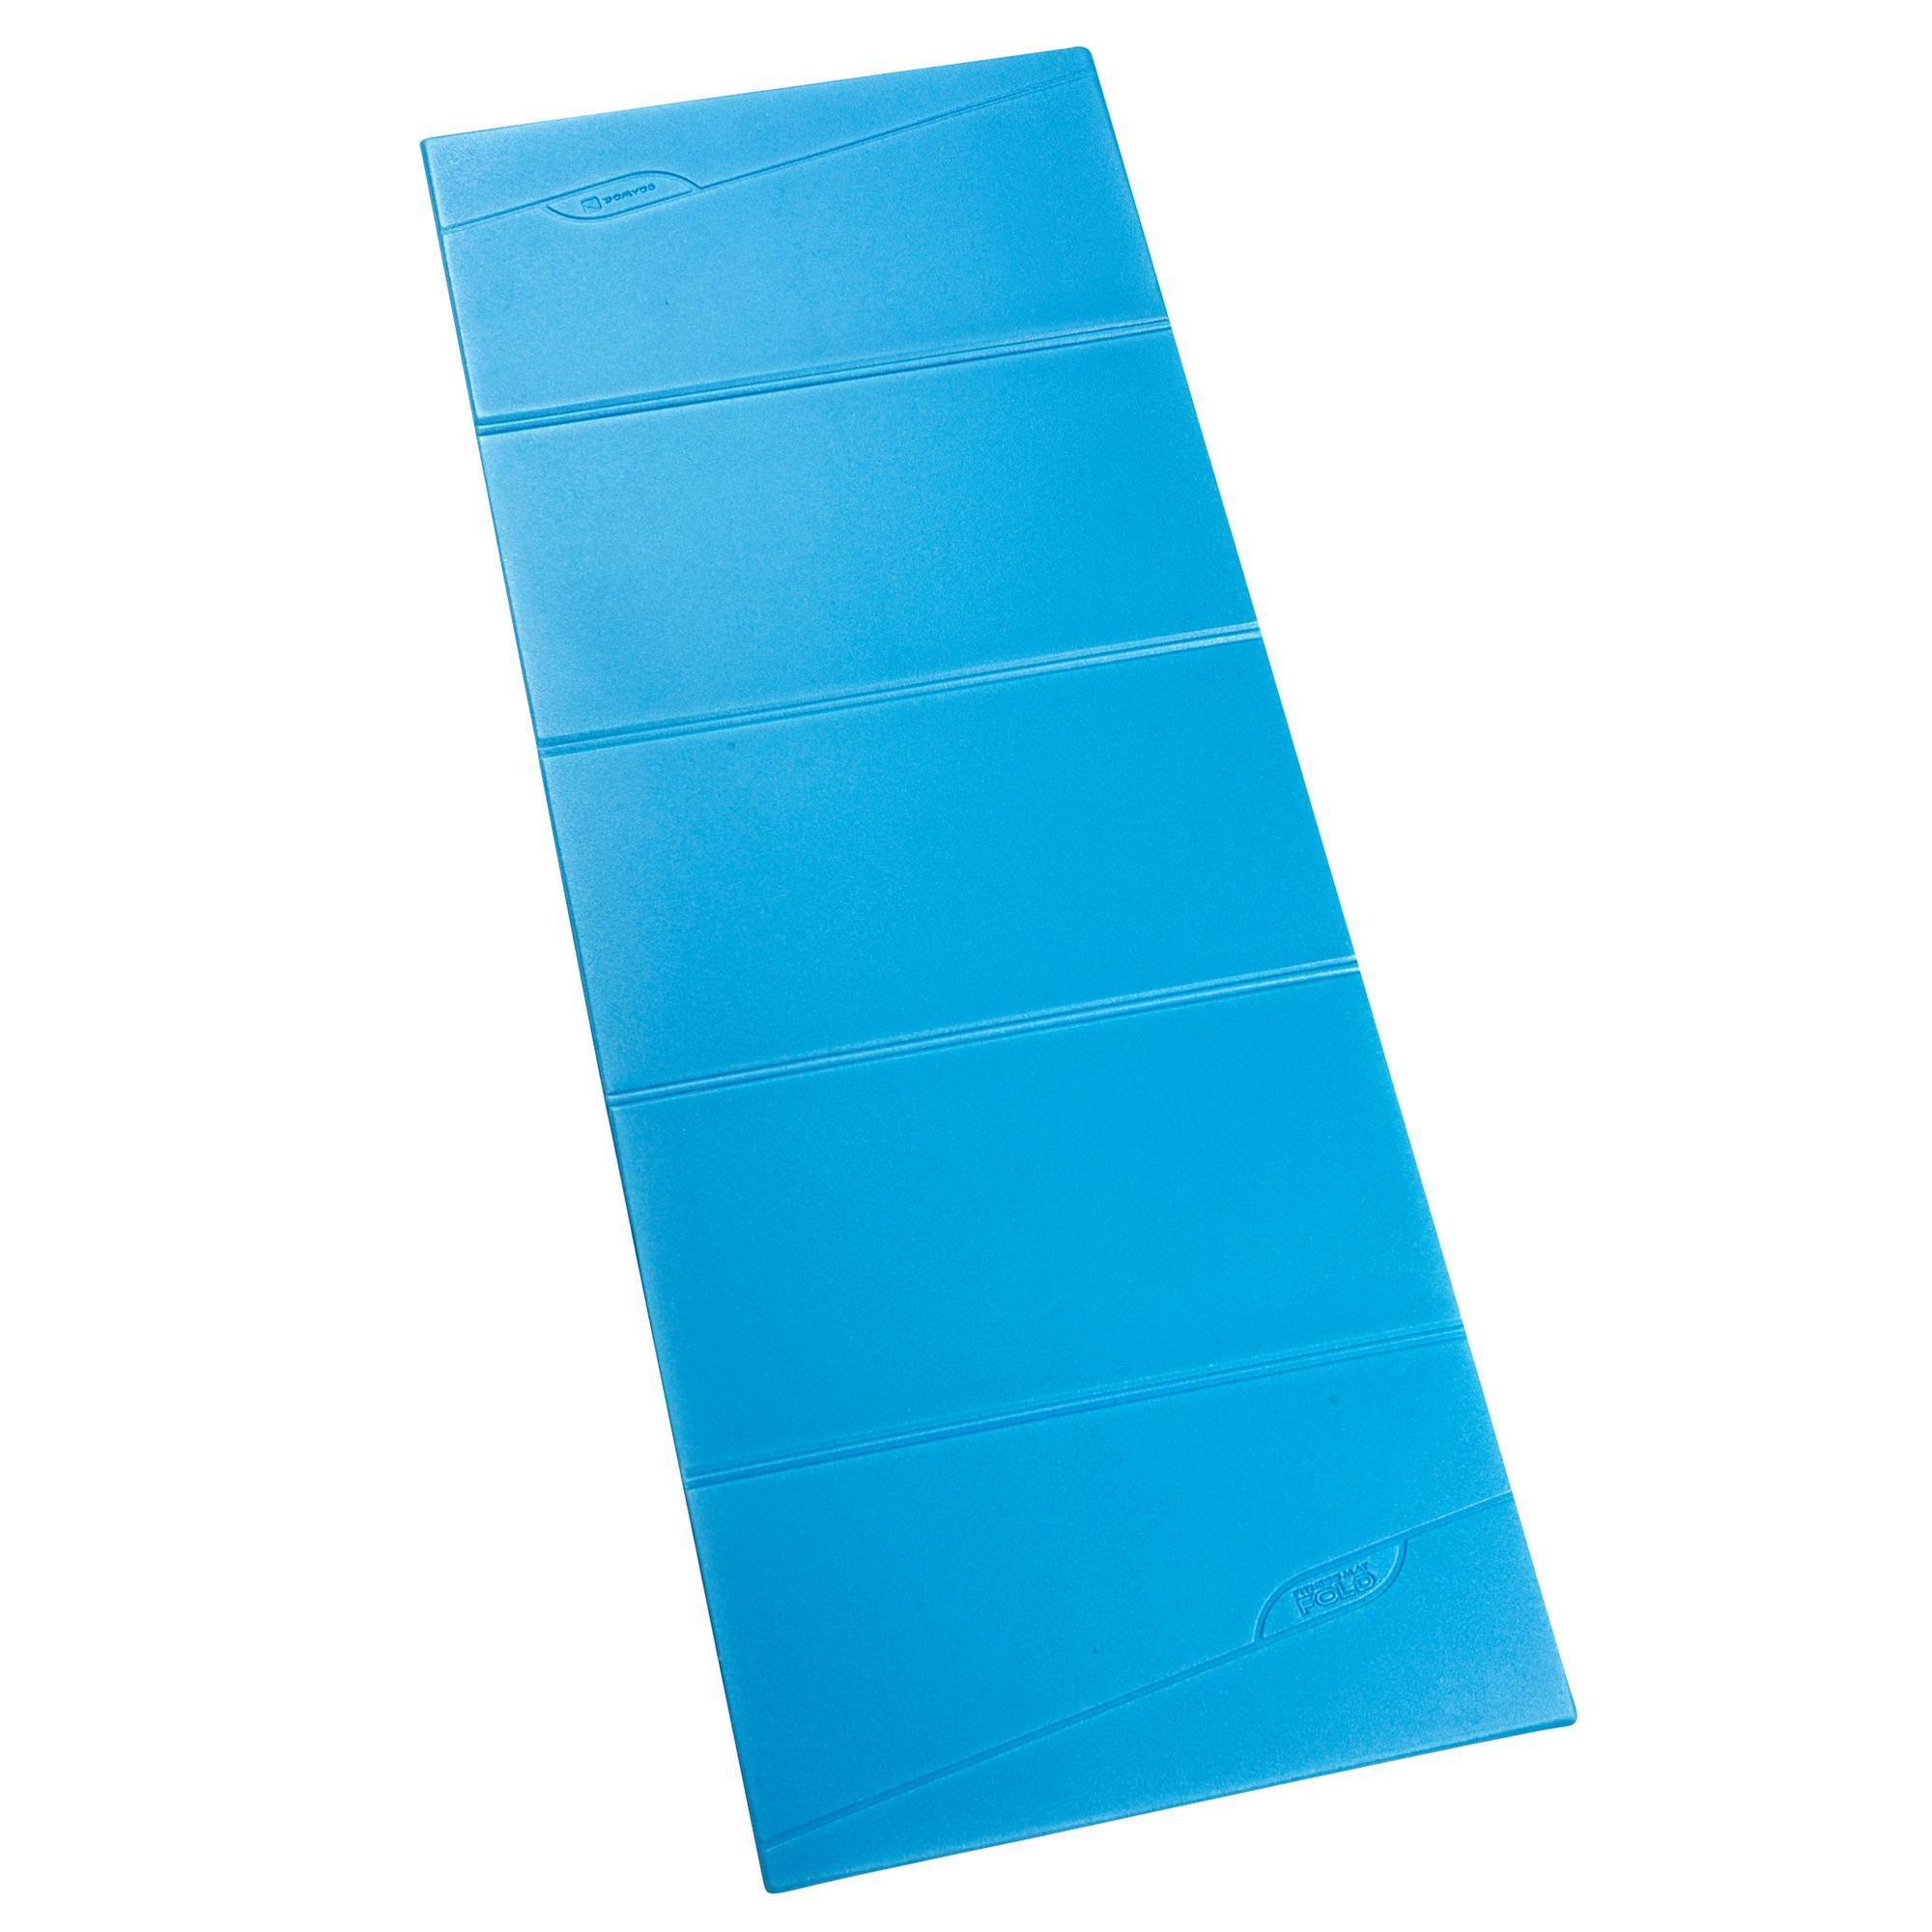 Tapis De Sol Fitness Pliable Fold Bleu Domyos By Decathlon